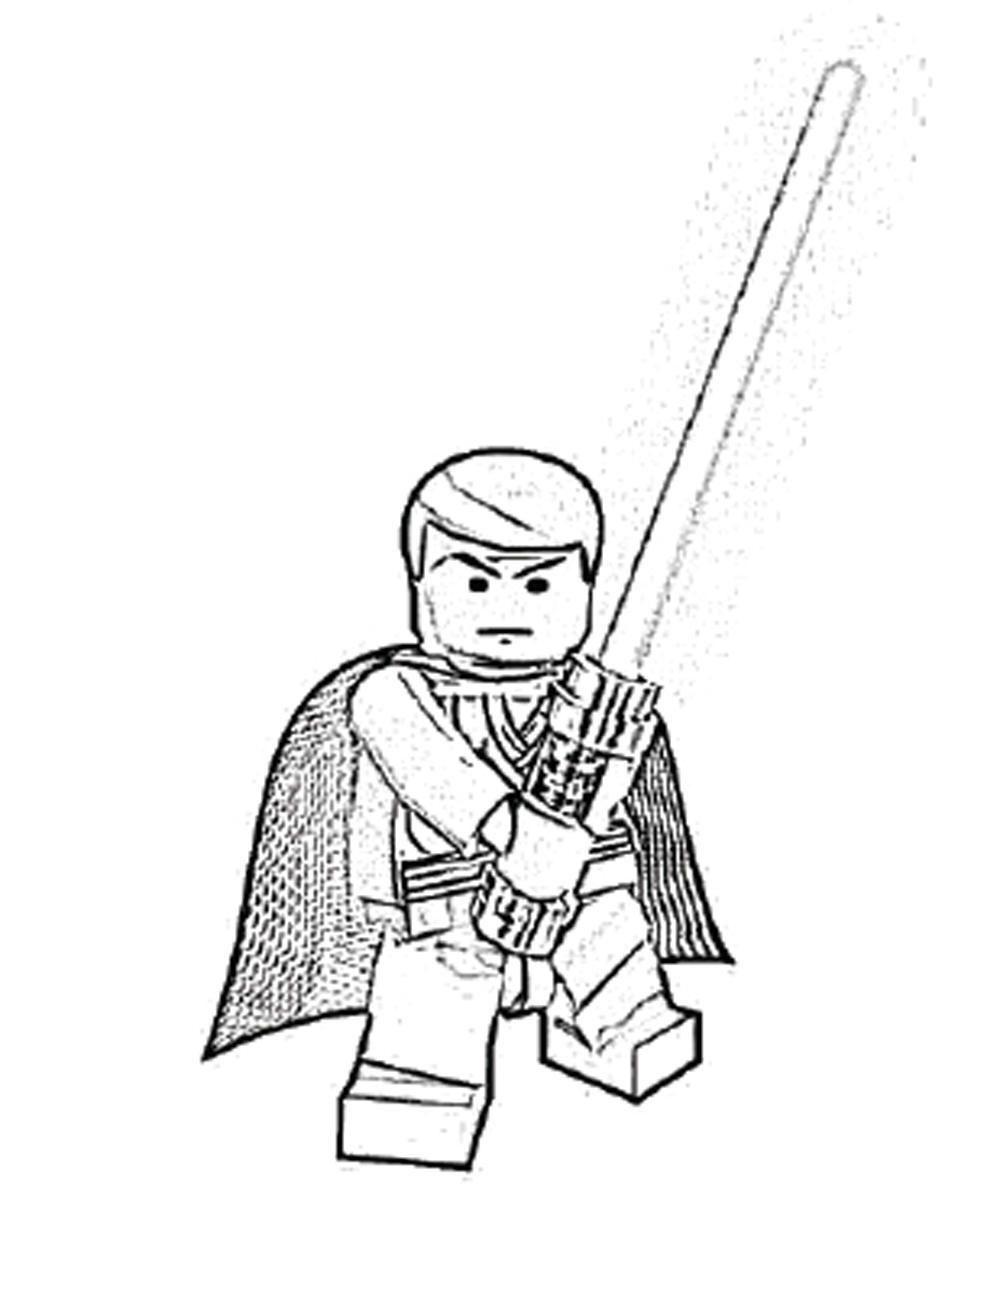 Lego Star Wars Luke Skywalker Coloring Pages Printable